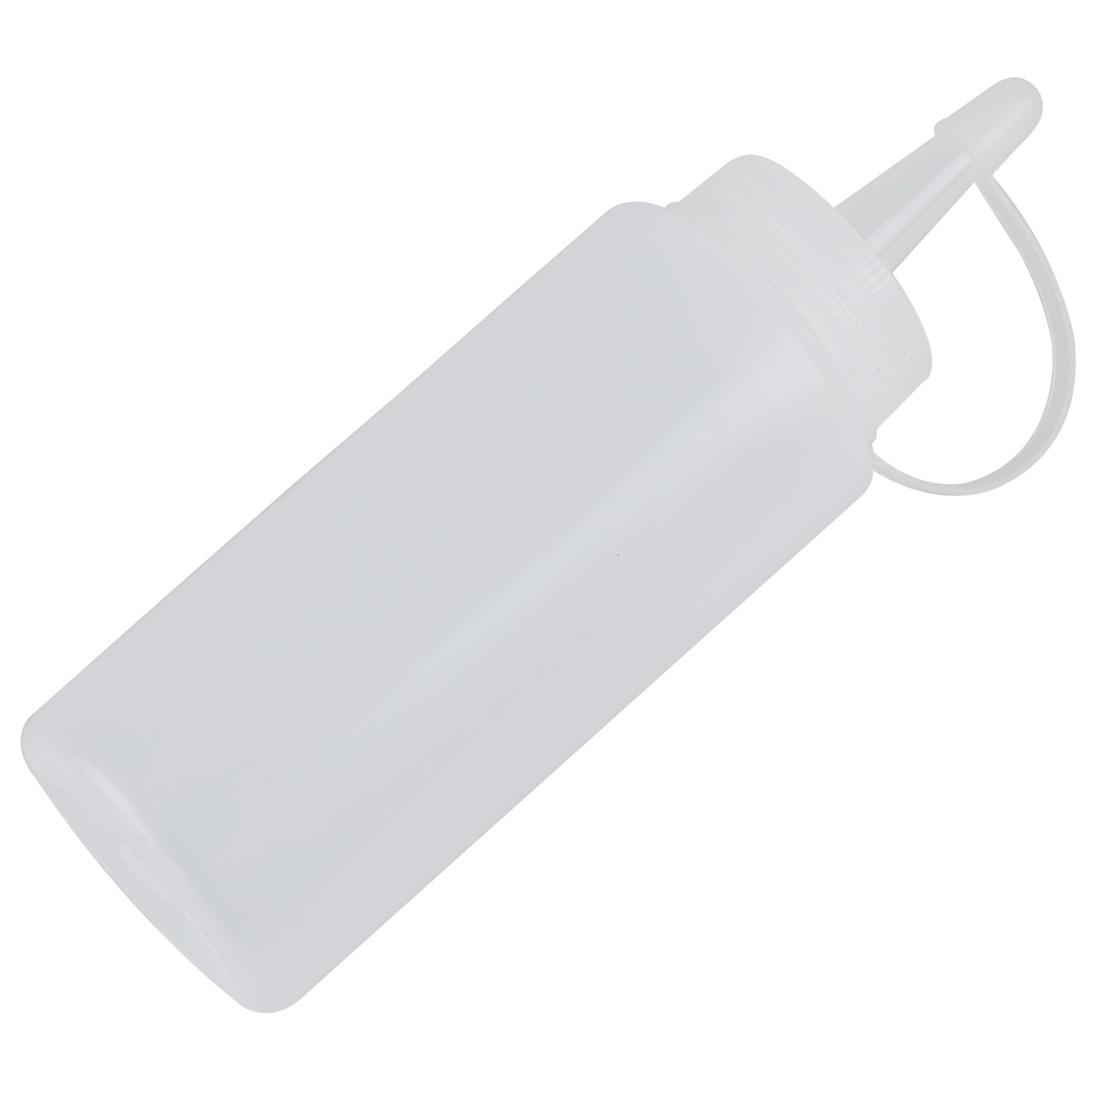 Plastic Clear 1000ml Squeeze Bottle Condiment Dispenser Ketchup Mustard Sauce